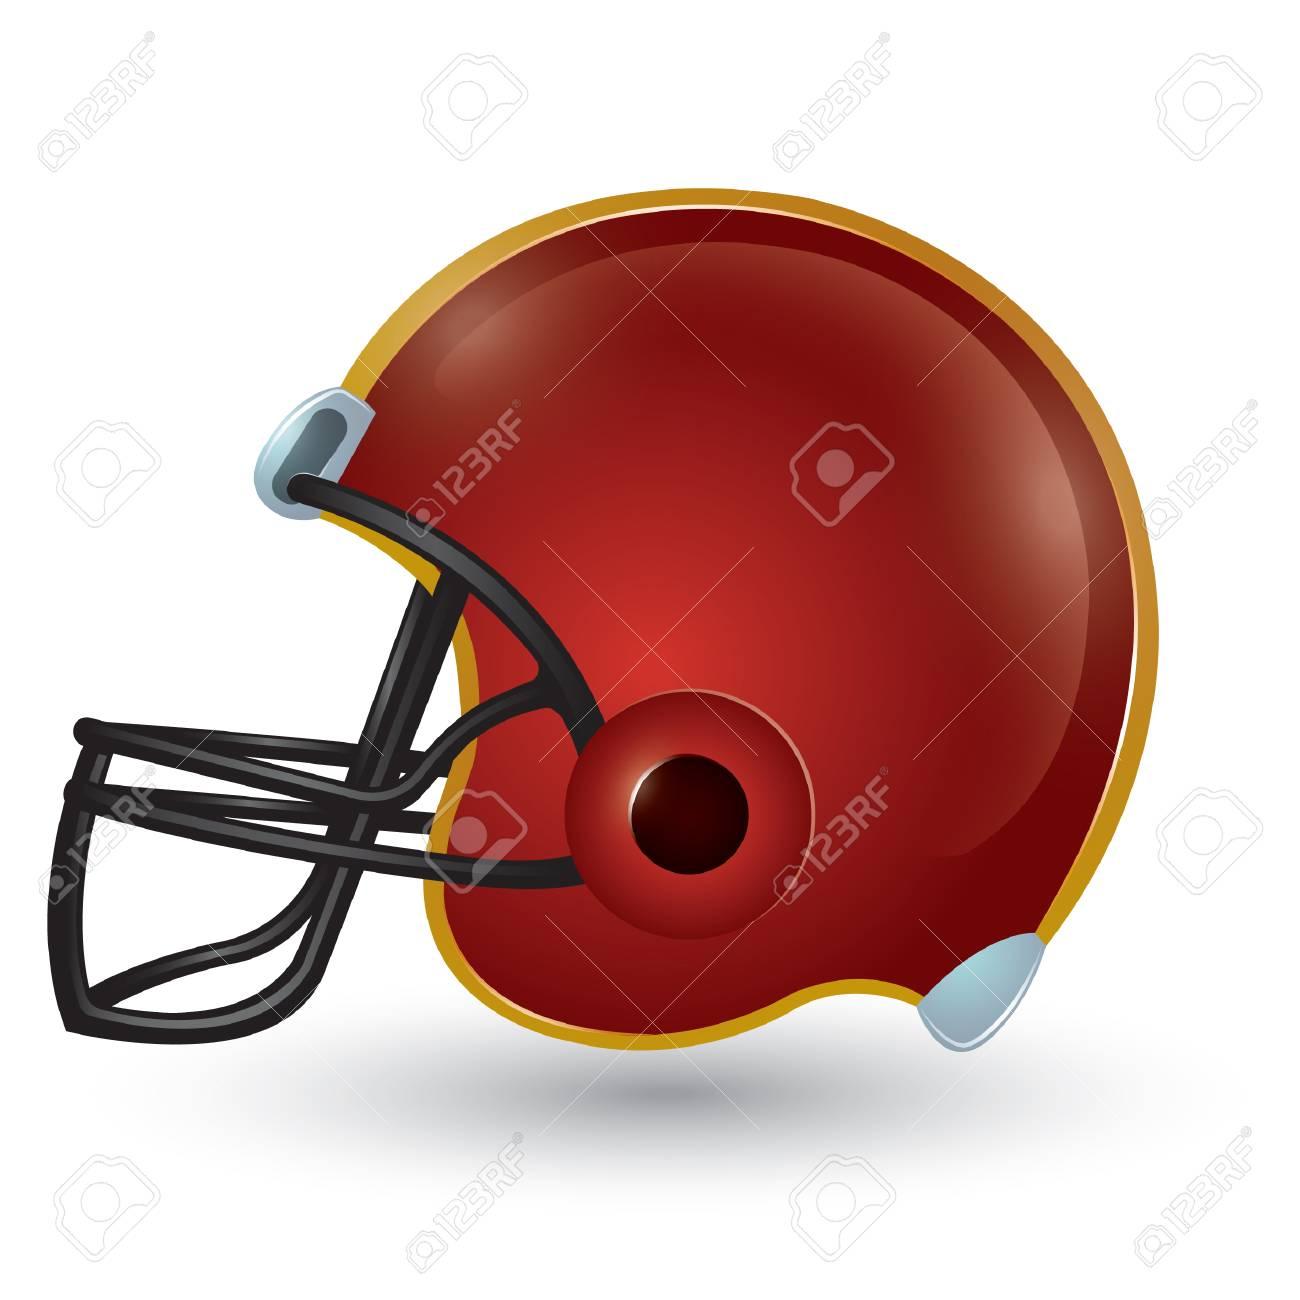 helmet - 106672890